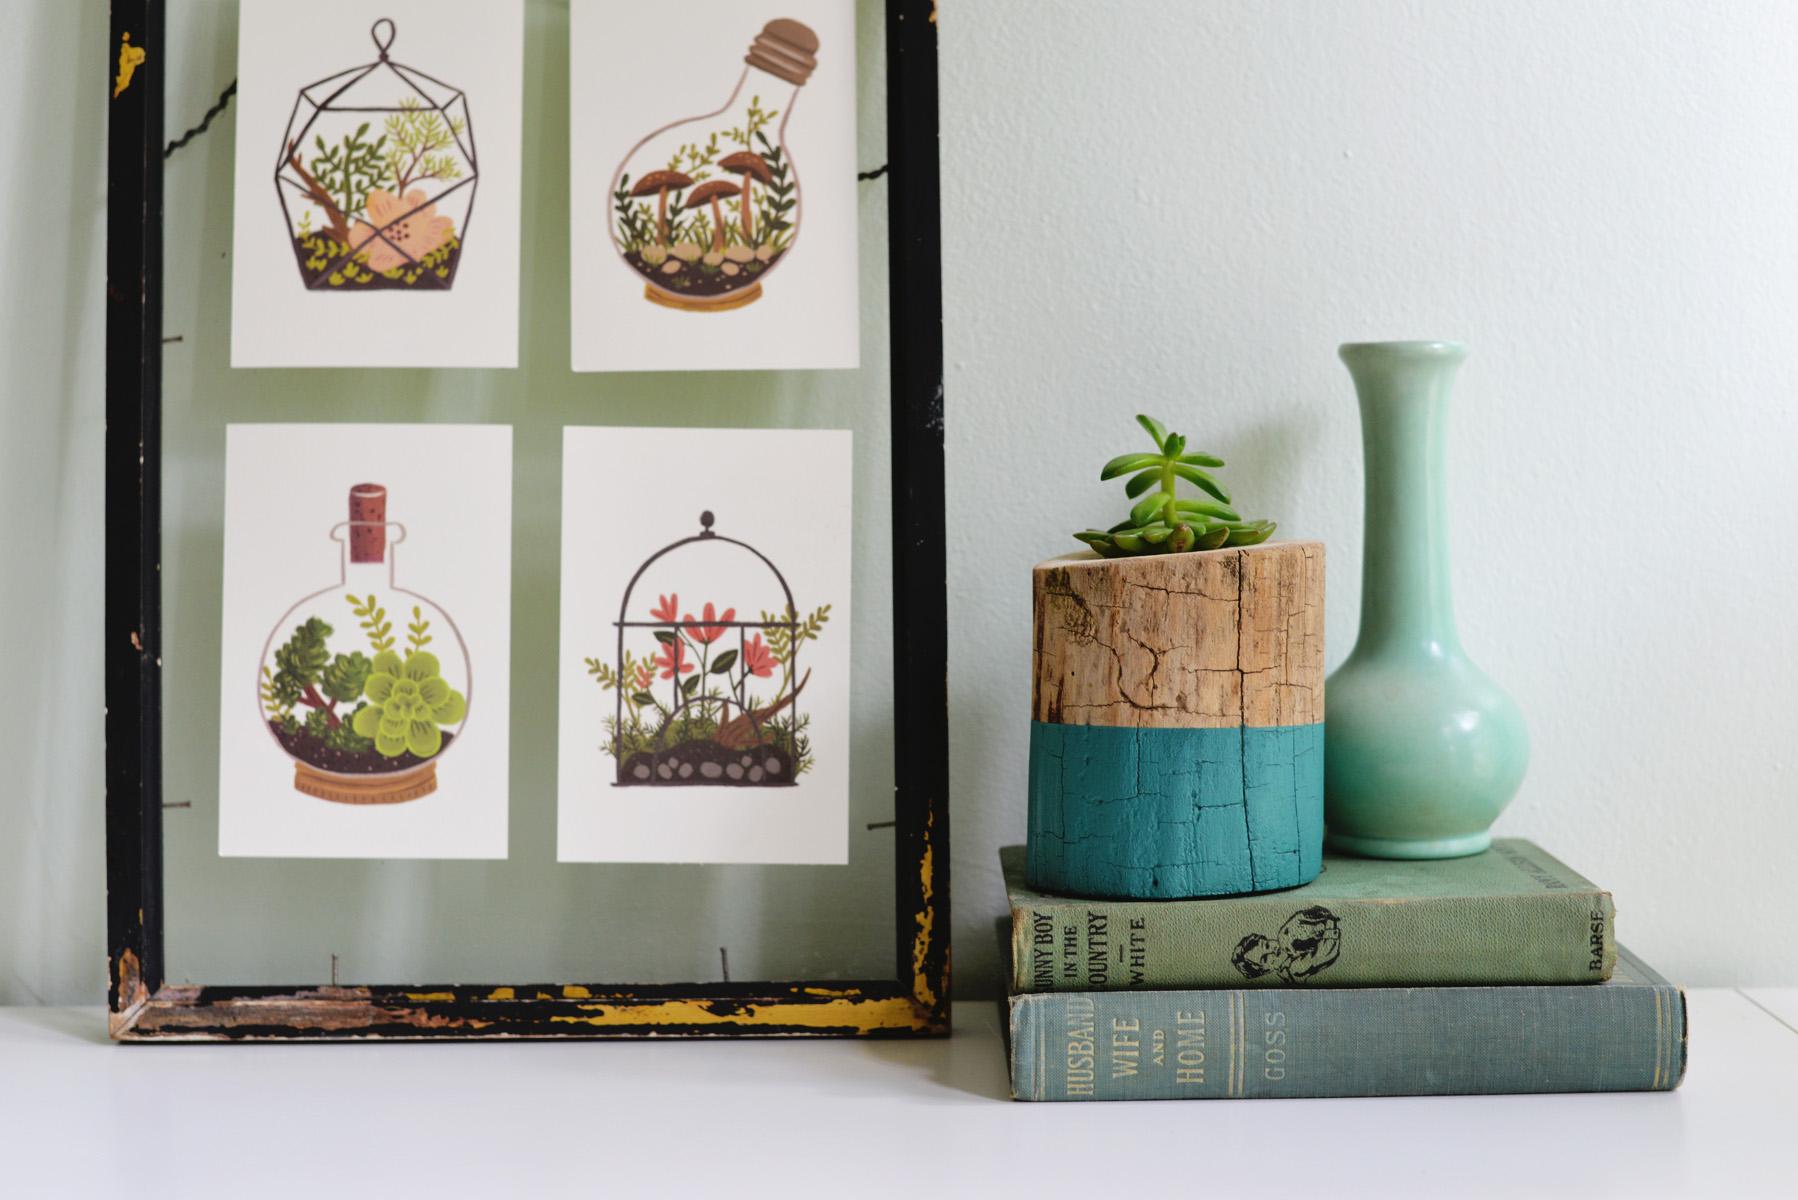 Smartly Trunk Planter 2015 Diy Cheap Easy Home Decoration Ideas Easy Diy Home Decorating Easy Diy Home Decorations home decor Easy Diy Home Decorating